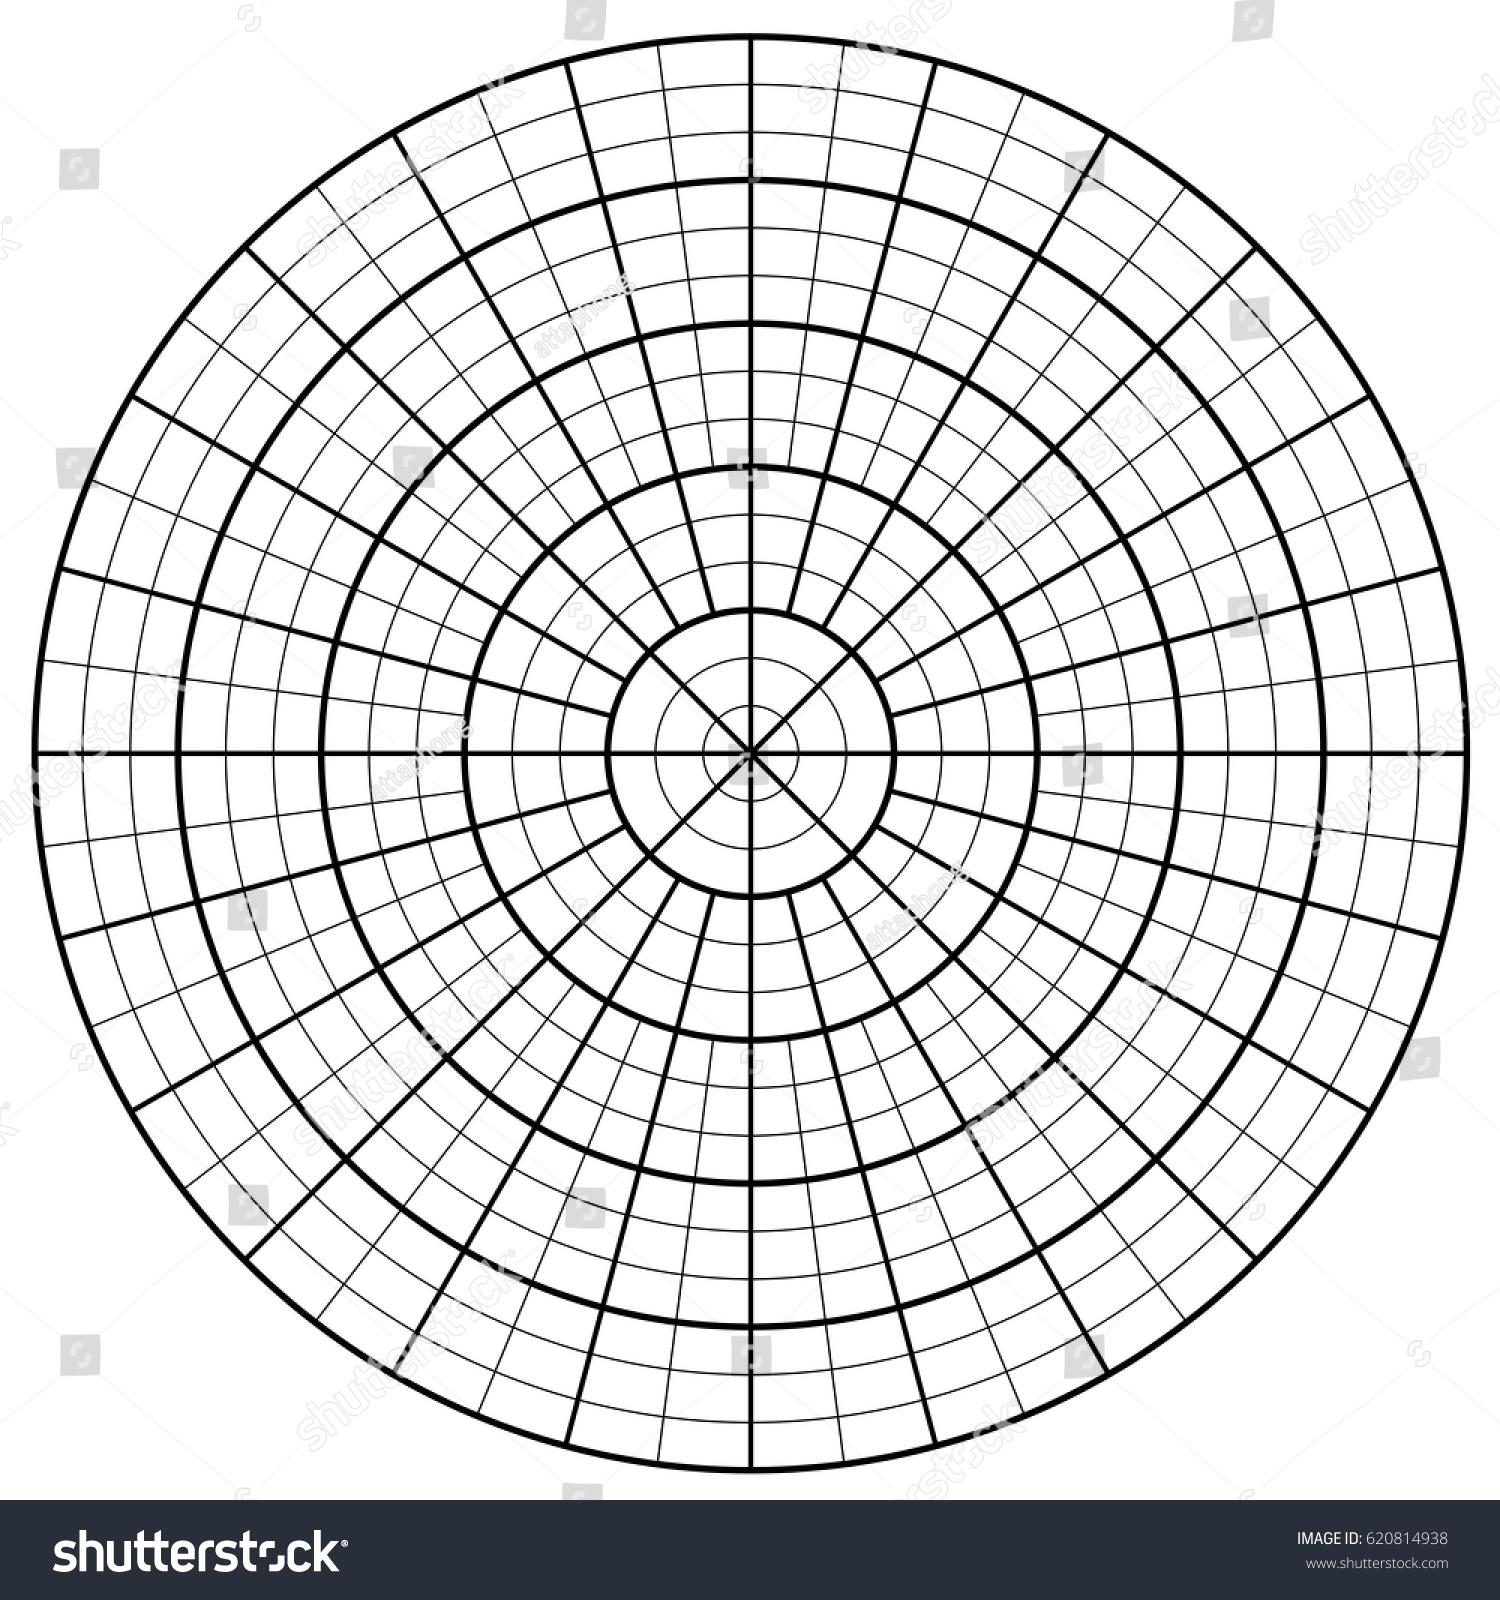 blank polar graph paper protractor pie stock vector (royalty free